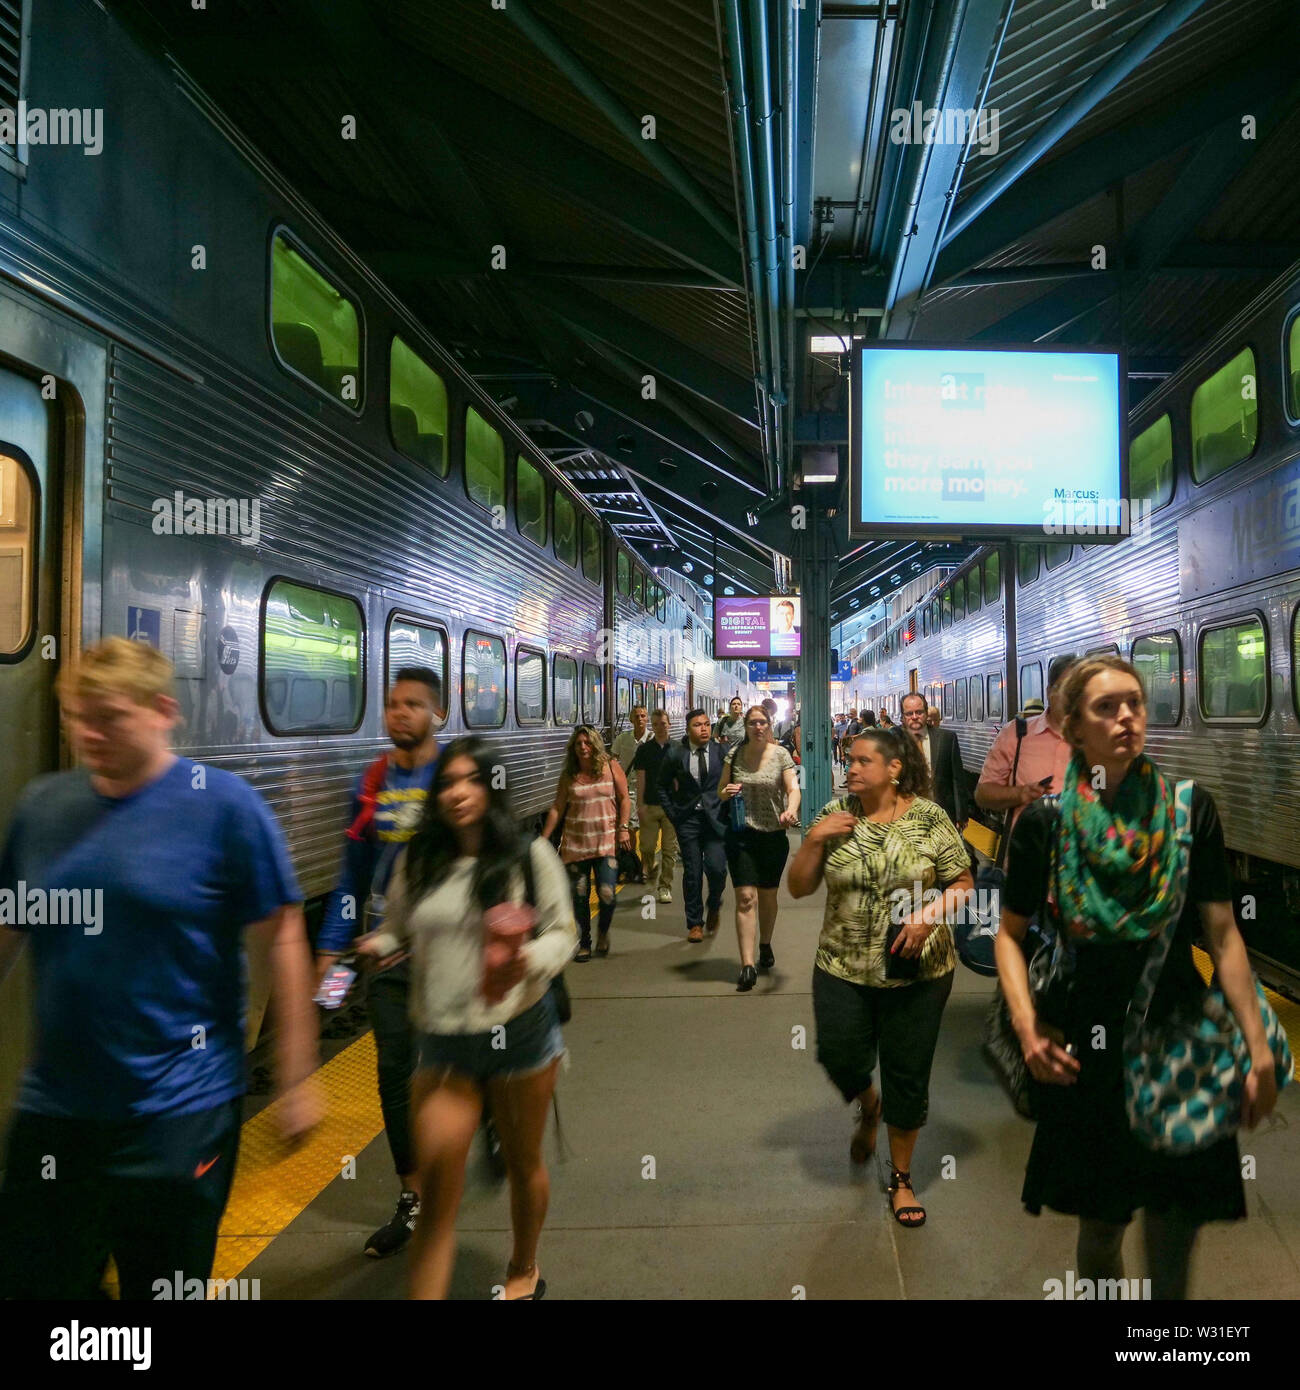 Blurred commuters, Ogilvie Transportation Center, Chicago, Illinois. - Stock Image